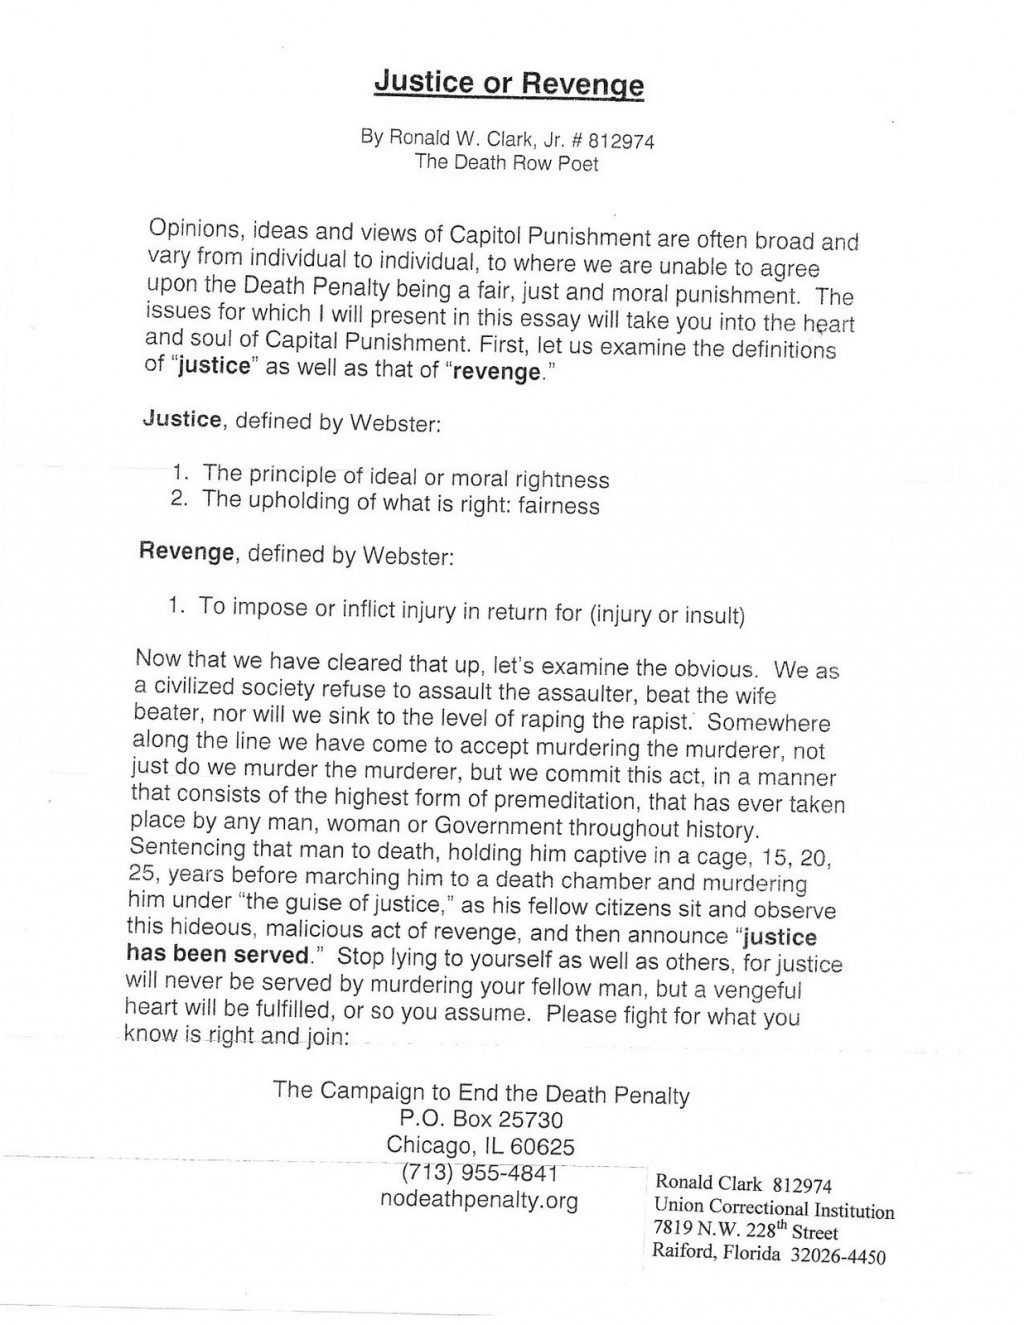 010 Death Penalty Essays Essay Example Scn 0008 Sensational Anti Conclusion Hook For Pro Argumentative Large